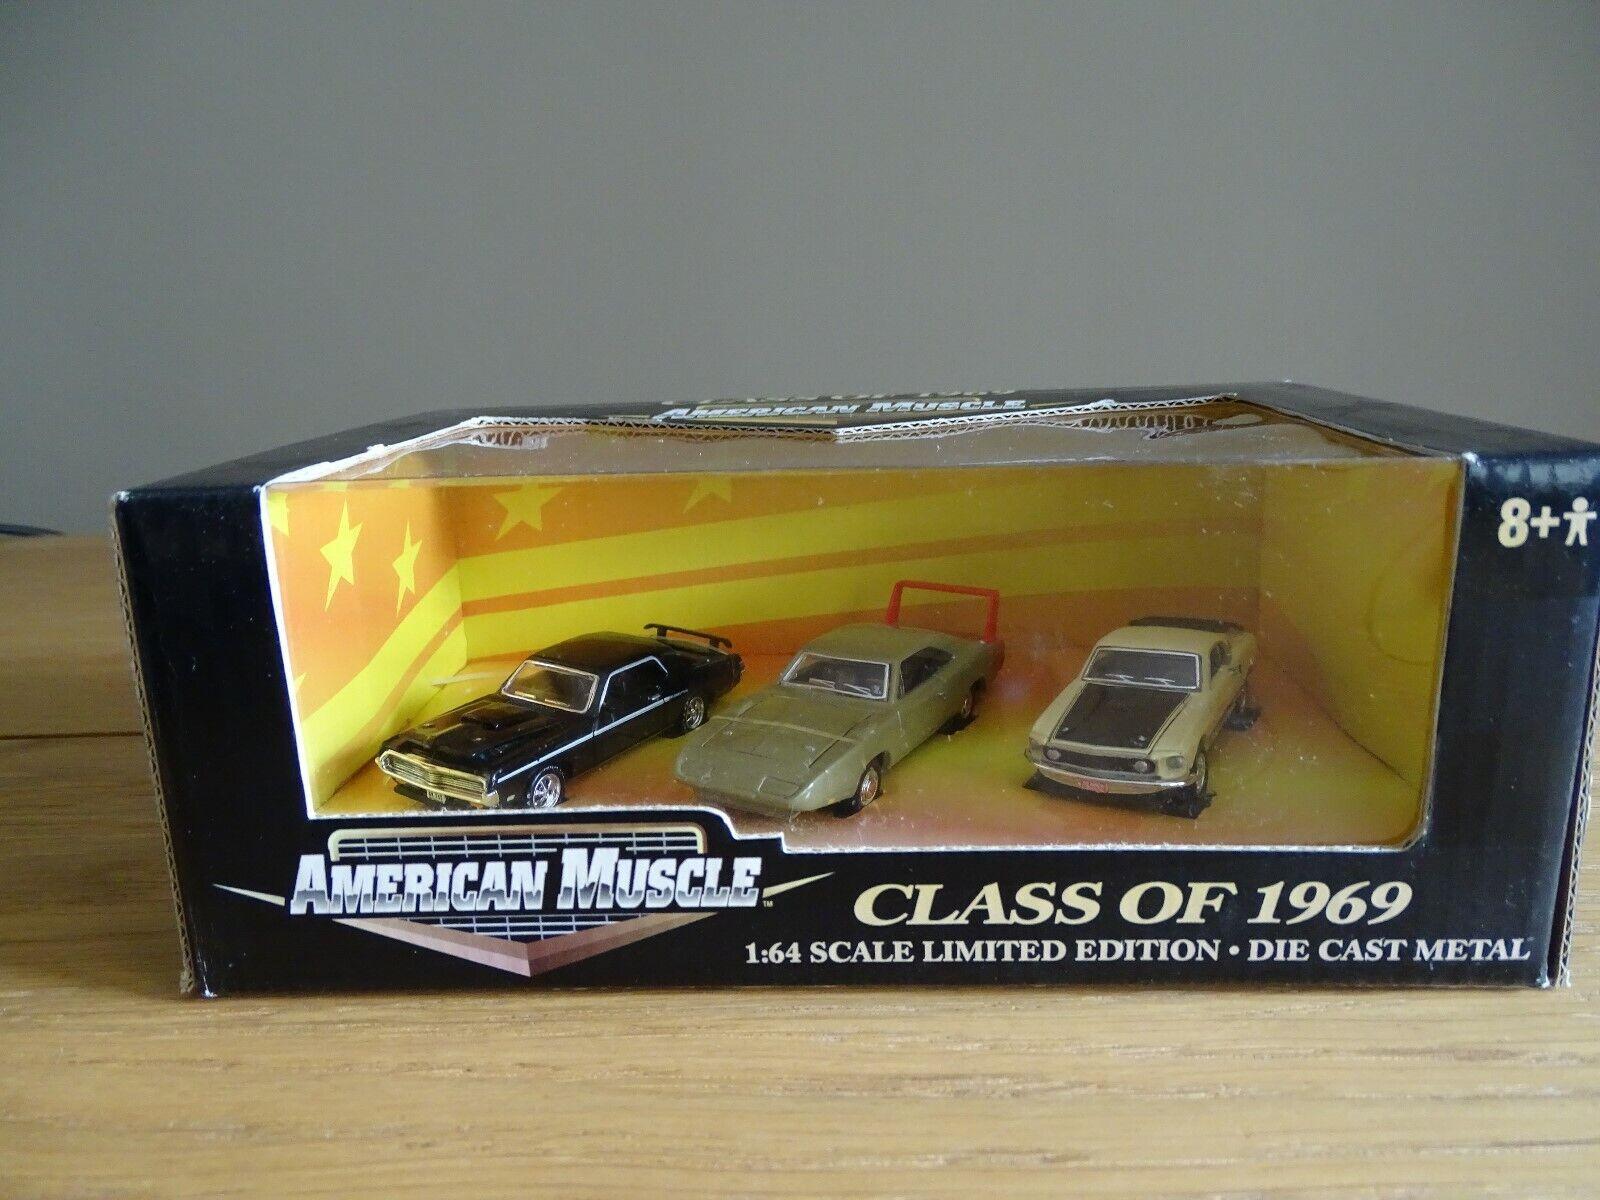 1 64 Ertl 32663 class of 1969 Cougar, Dodge Daytona, MUSTANG MACH 1 Lmtd. pm EDT.